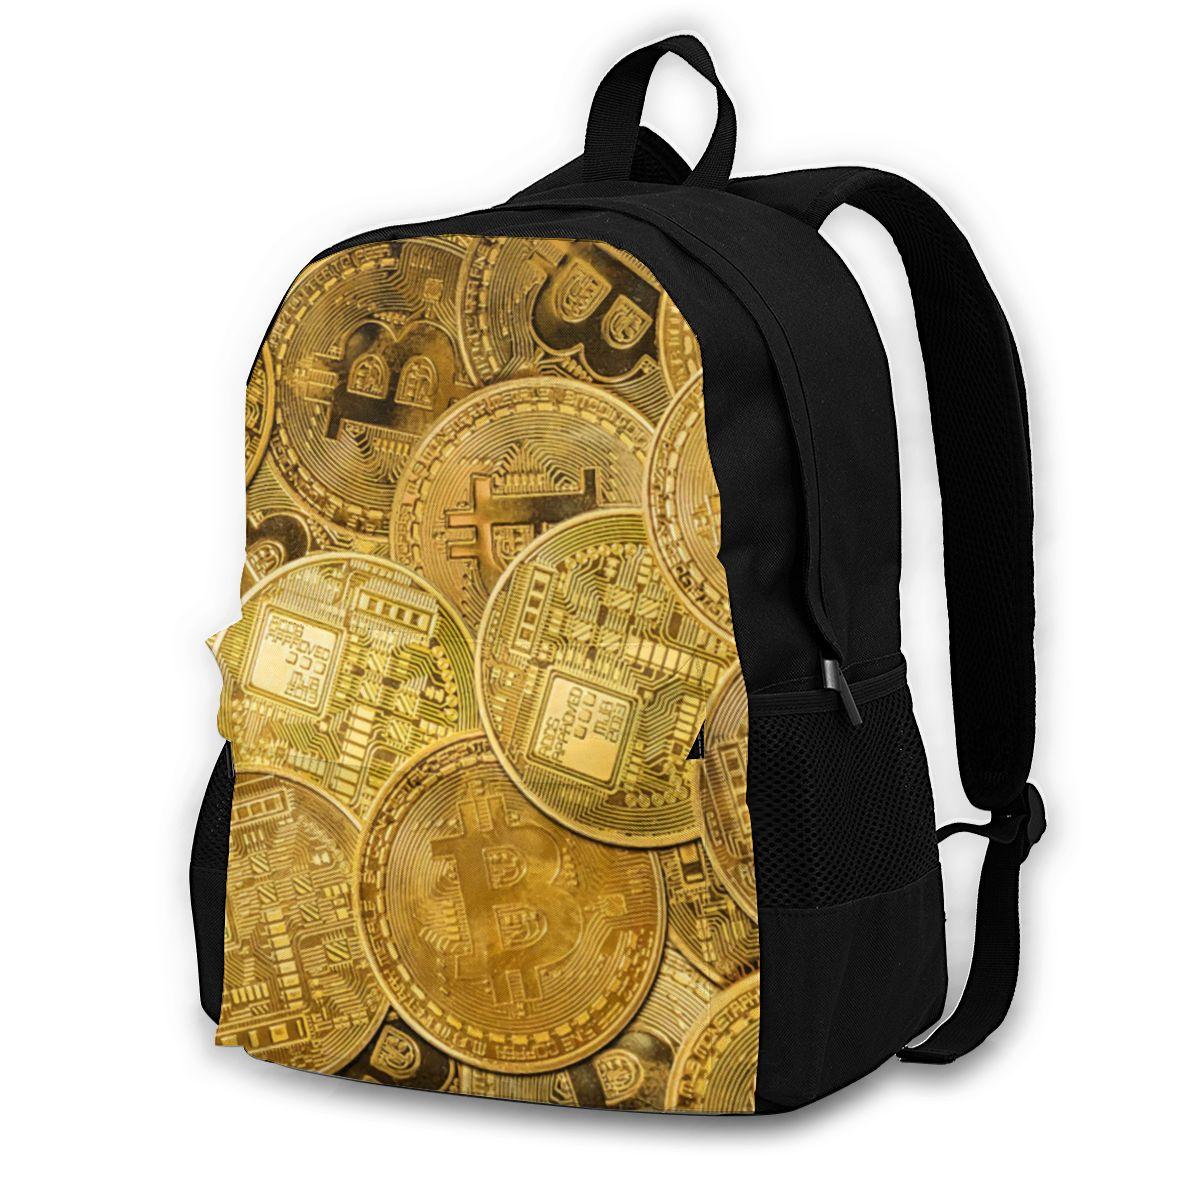 Bitcoin Backpacks Picnic Girl Print Backpack Fun Polyester Bags 1